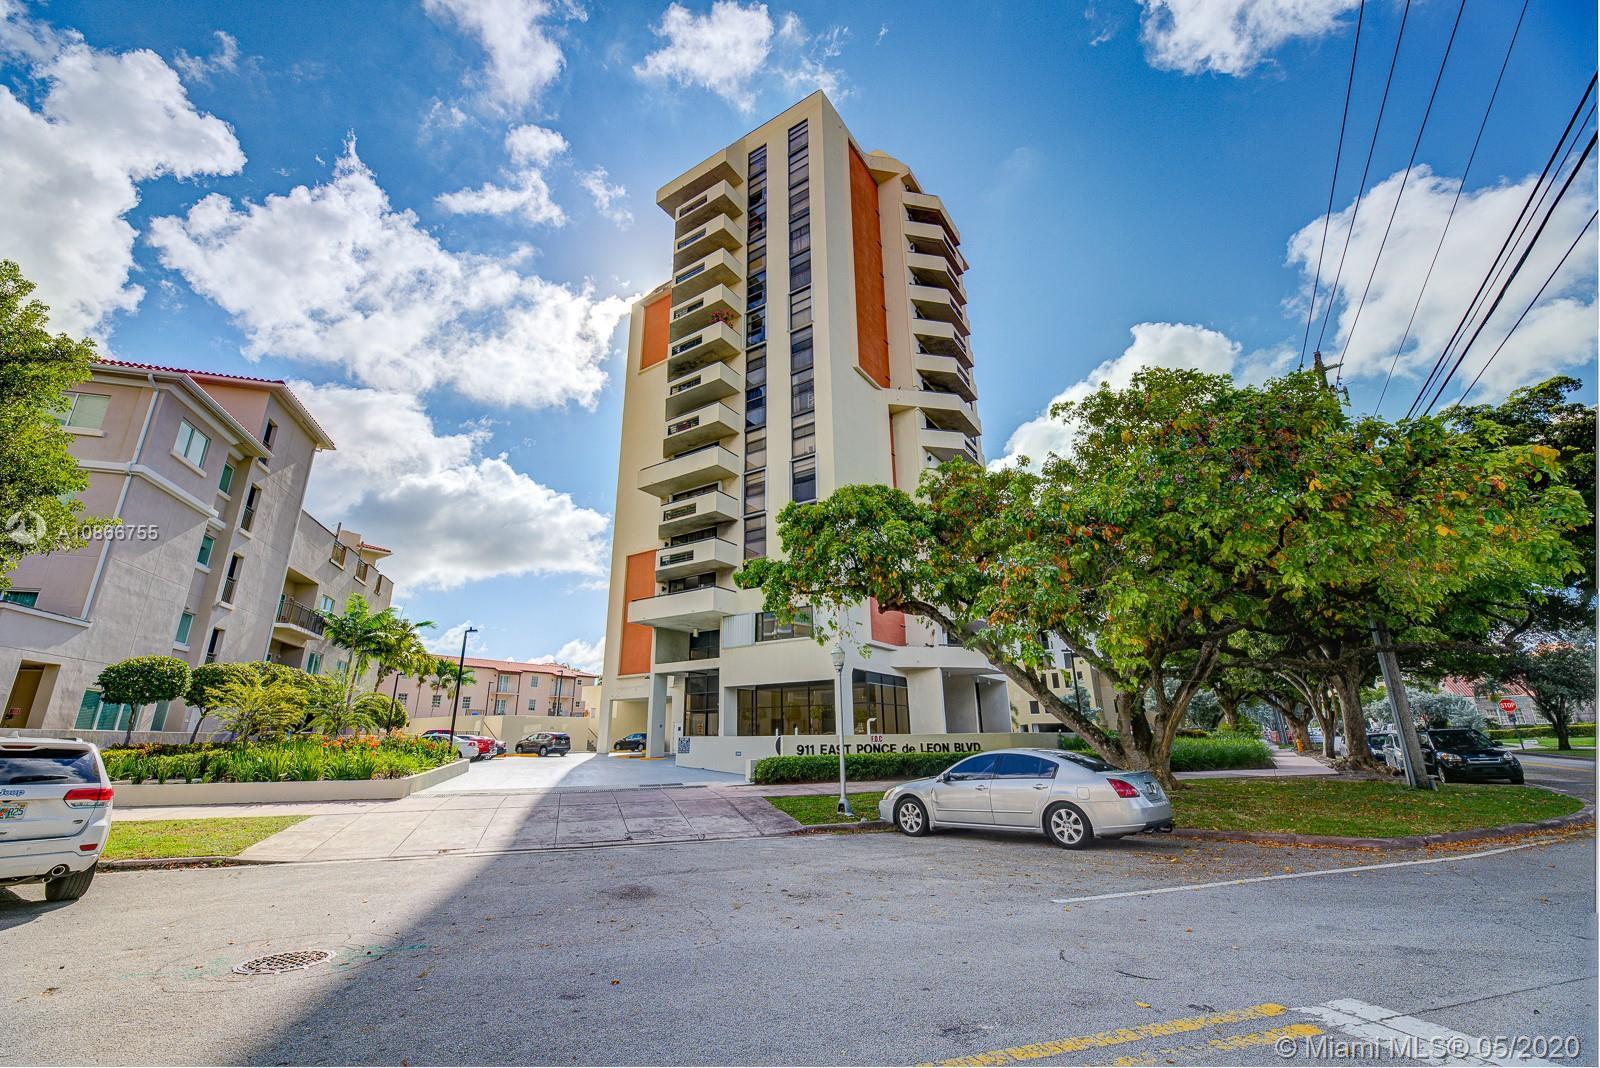 911 E Ponce De Leon Blvd #1104 For Sale A10866755, FL